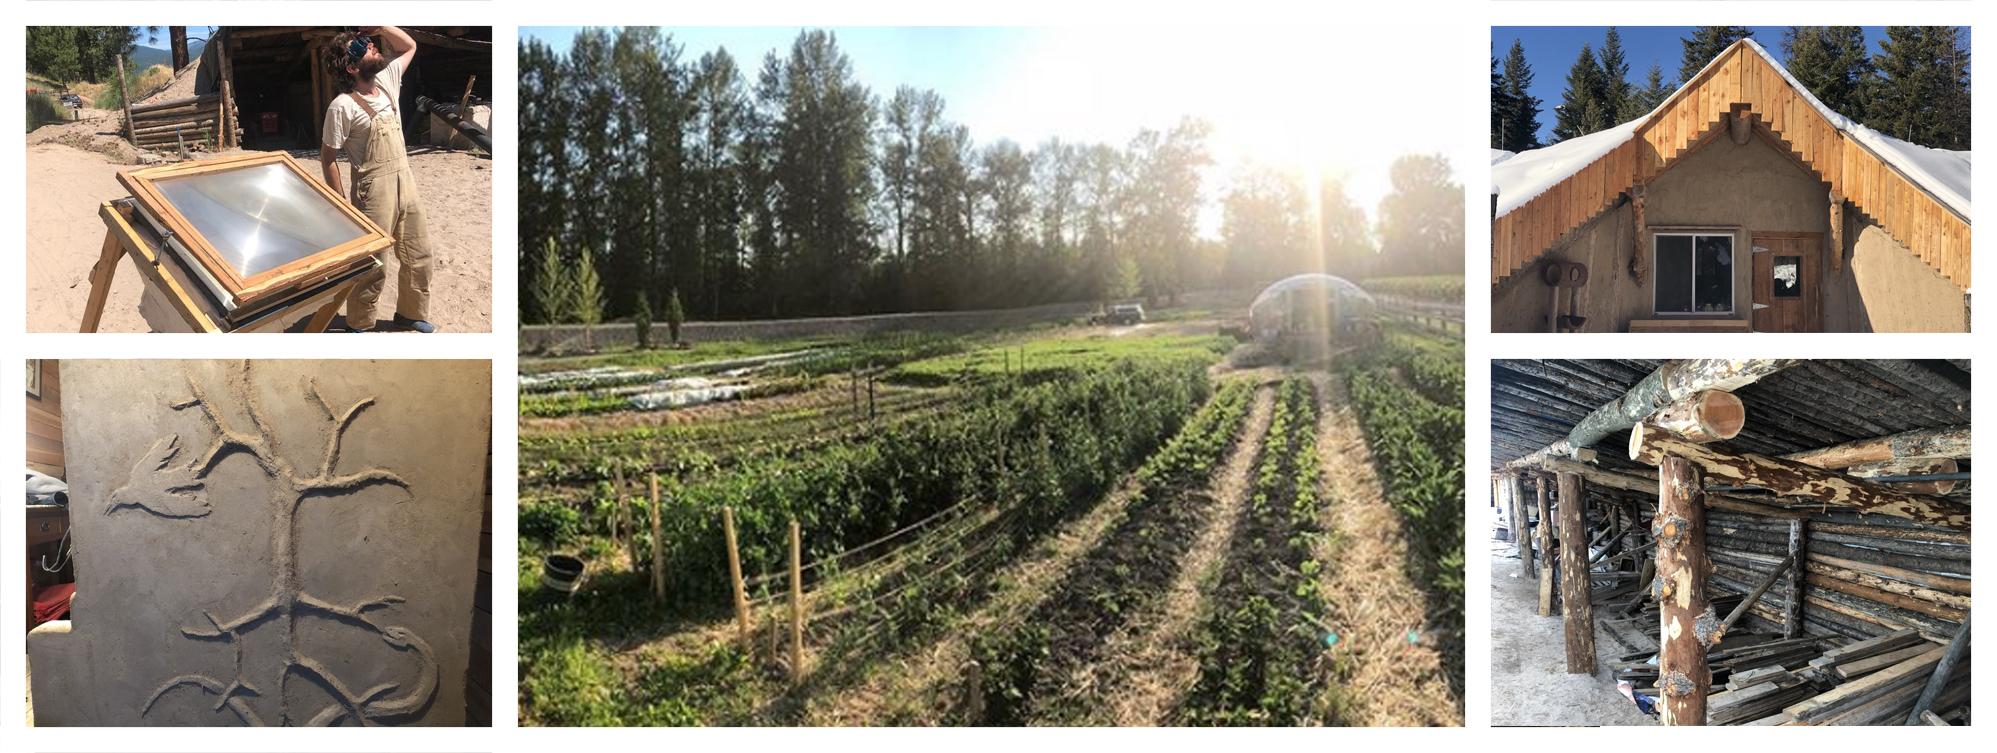 josiah solar glass recycler, garden, wofati rocket stove